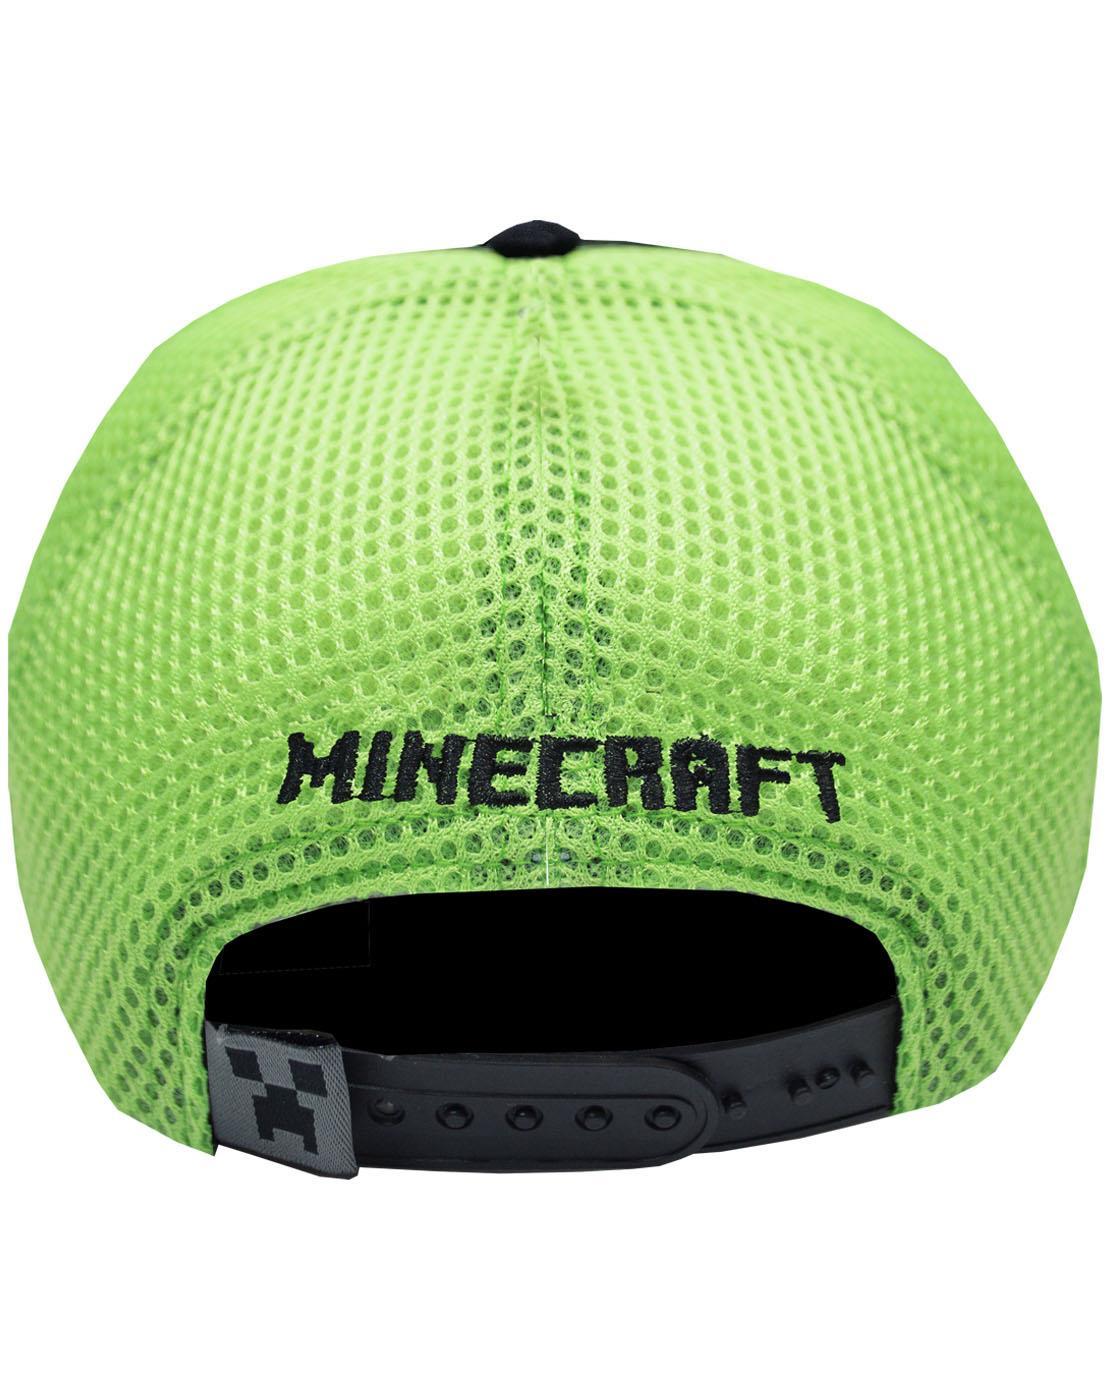 Creeper Diamond Steve Overworld Minecraft Boys//Youth Baseball Snapback Caps